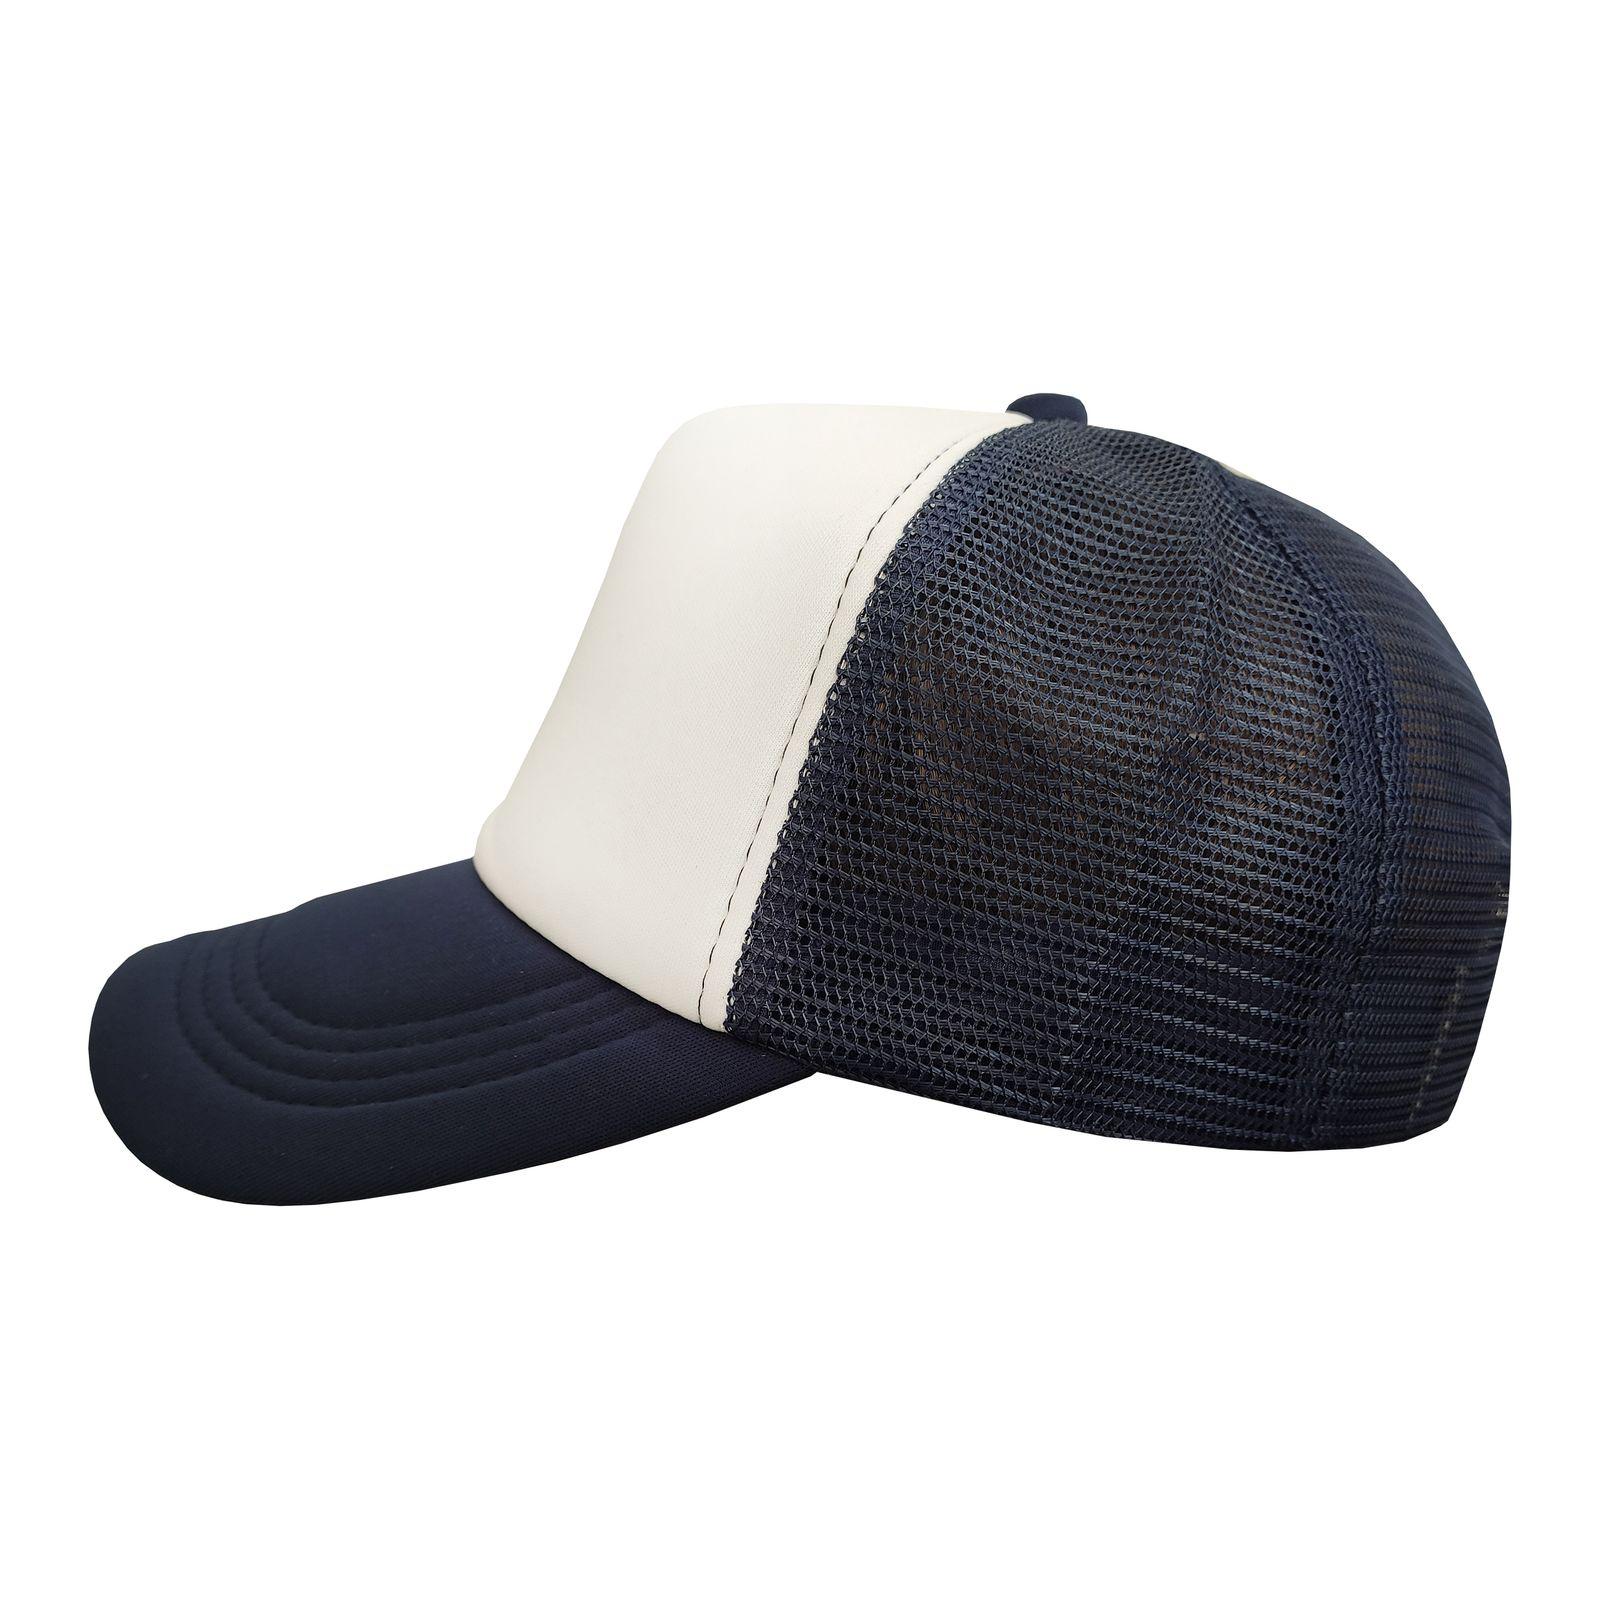 کلاه کپ کد PT-RA-30201 -  - 5